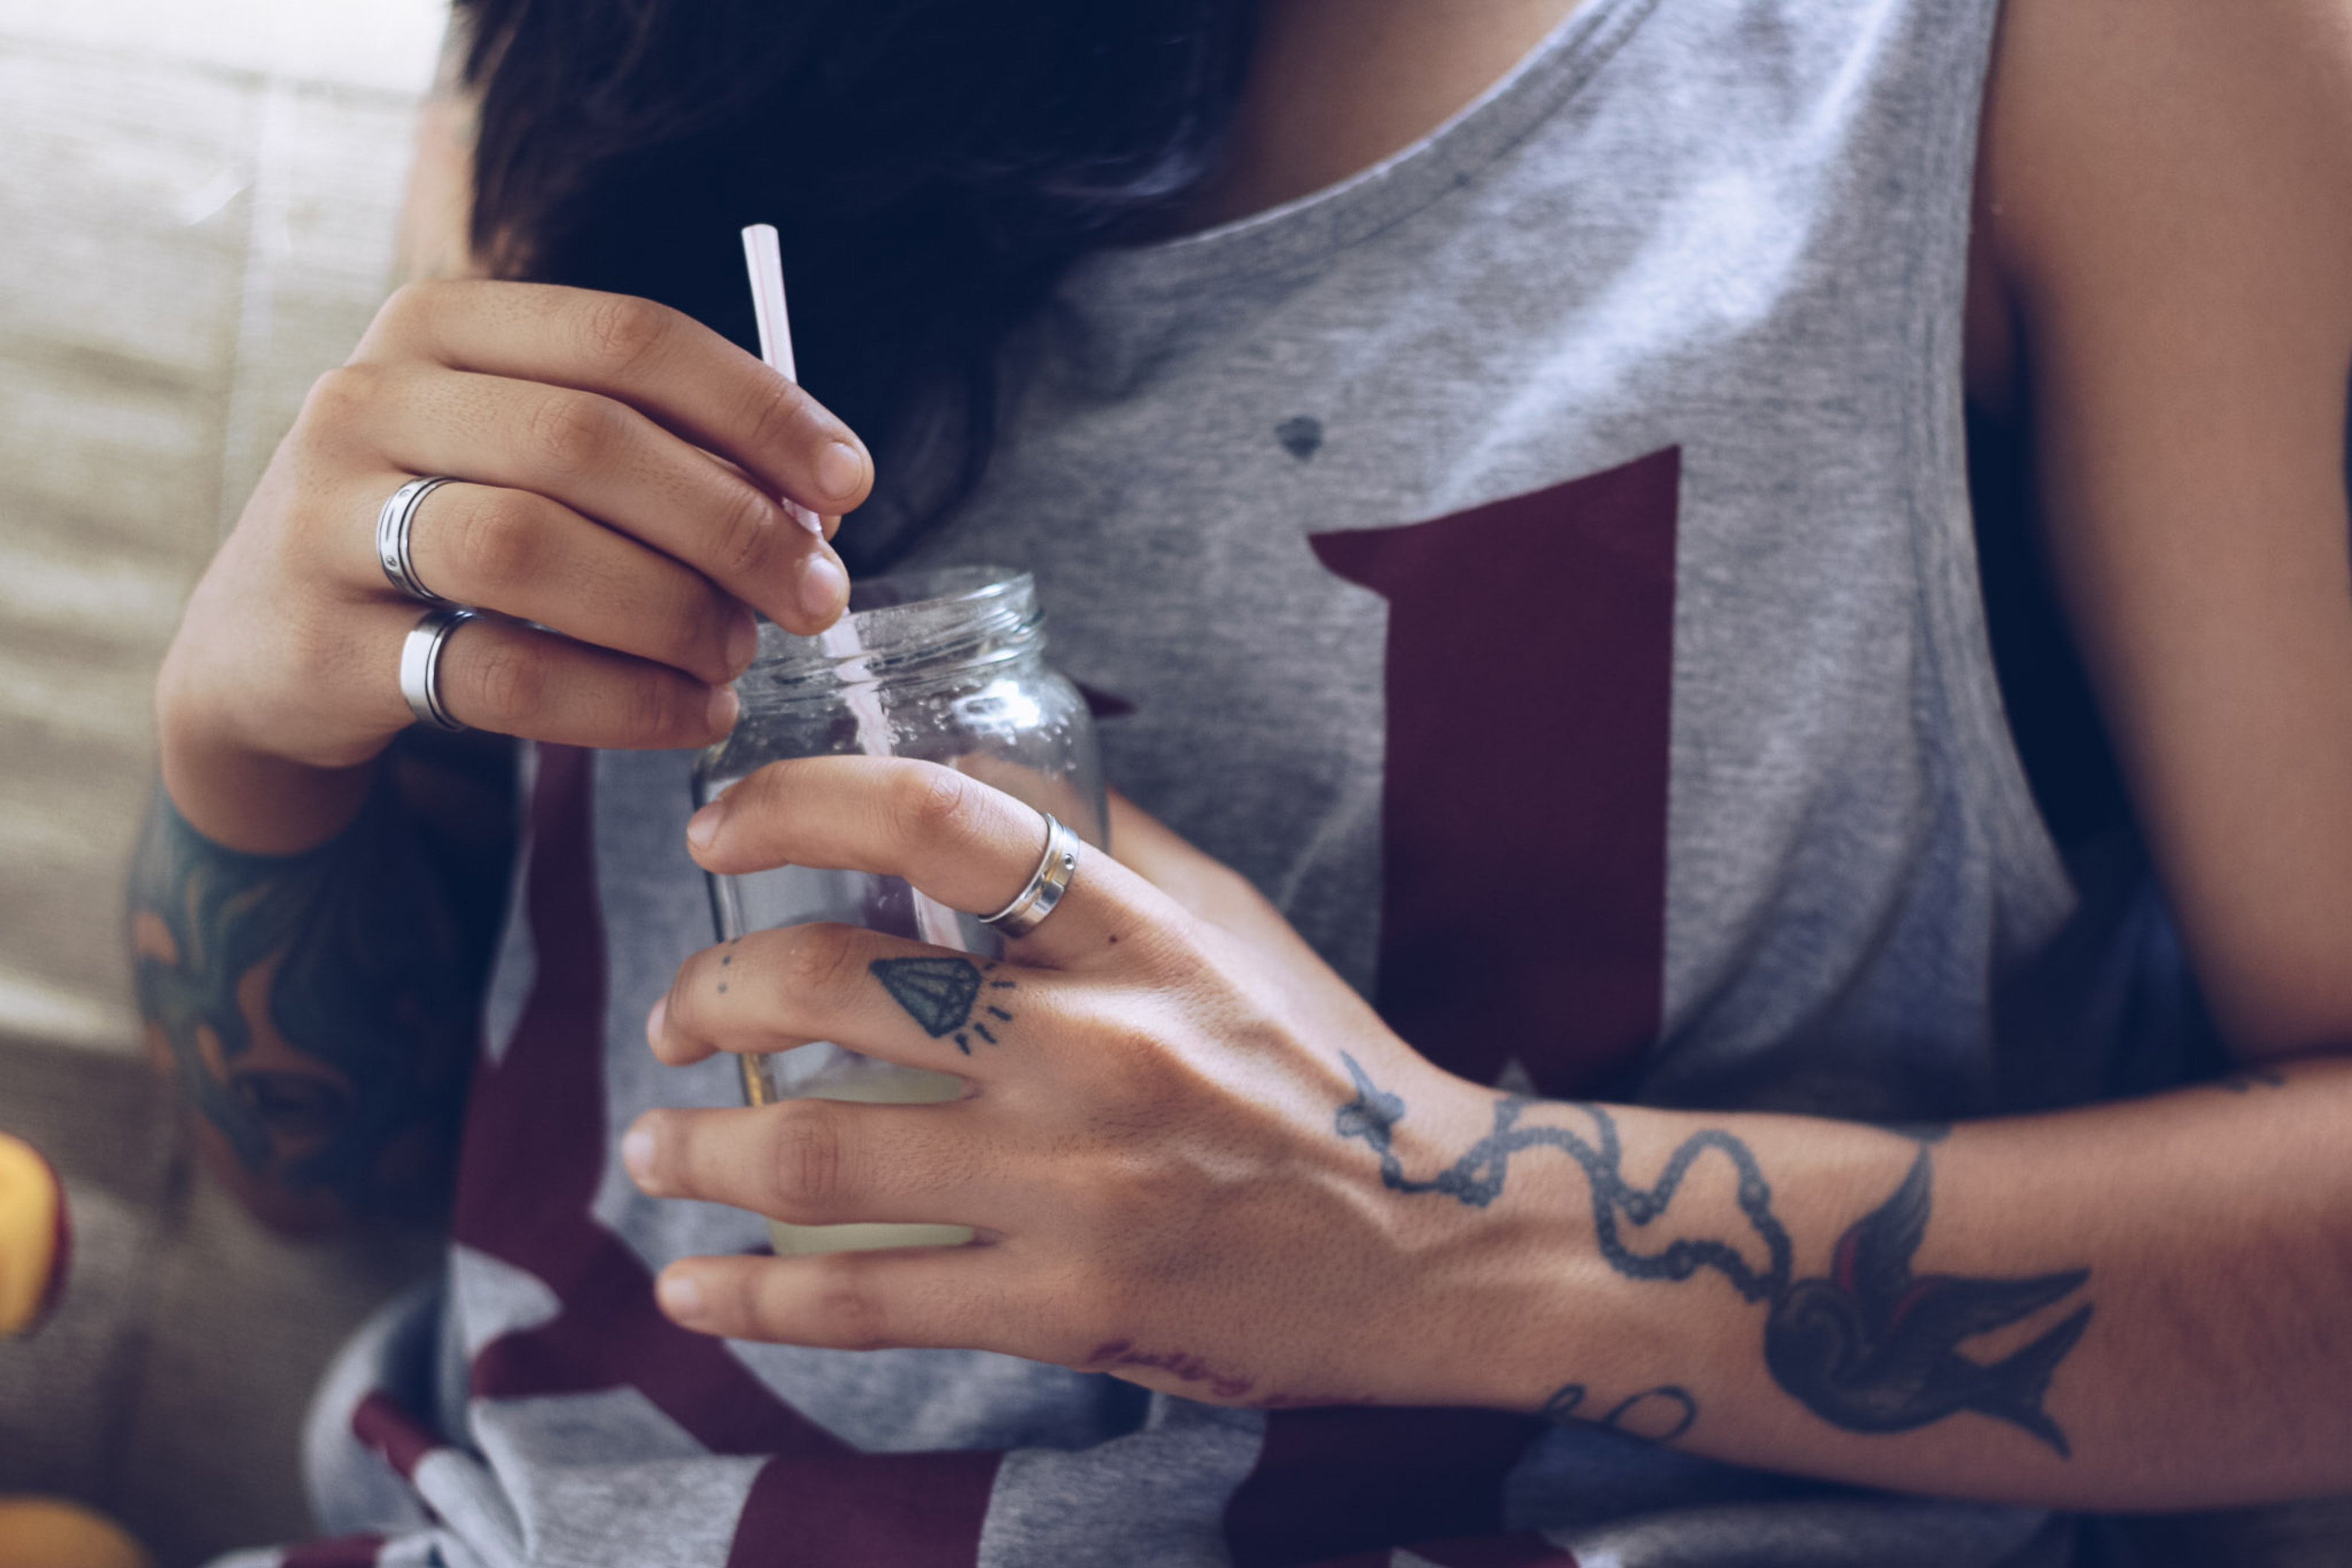 woman sitting holding bottle